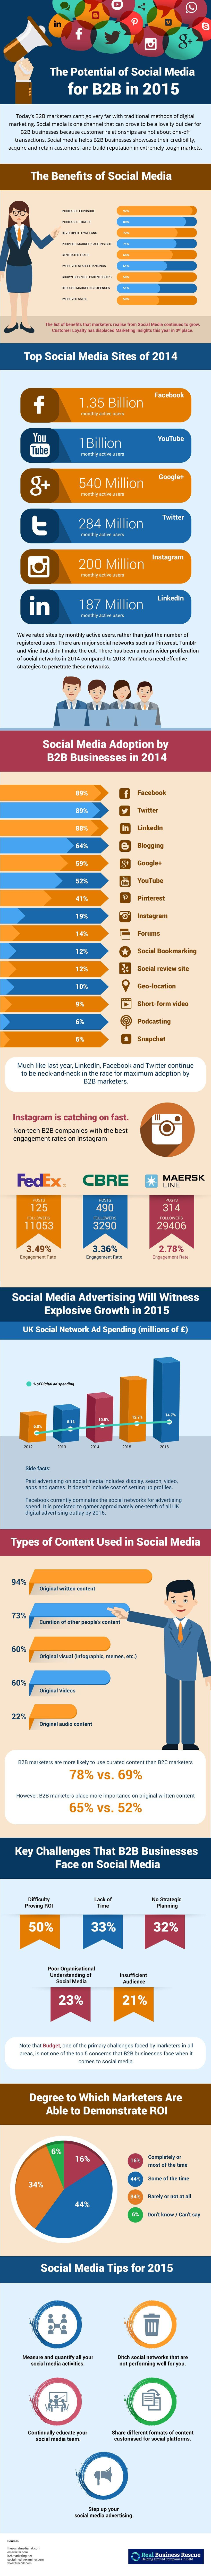 Social media and B2B in 2015